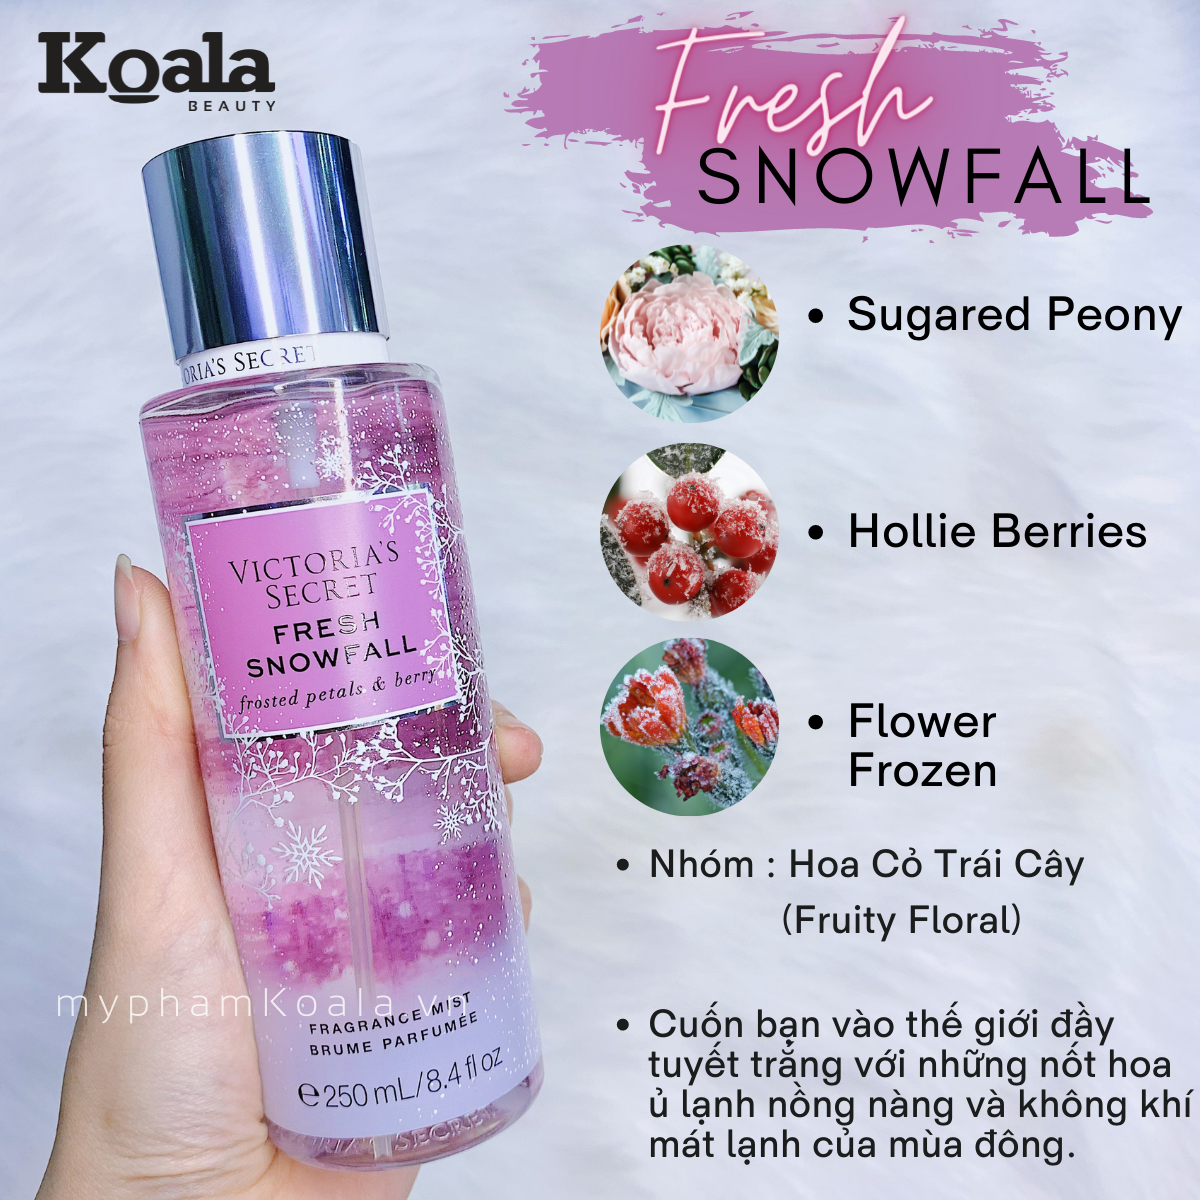 Xịt Body Victoria's Secret FRESH SNOWFALL Fragrance Mist